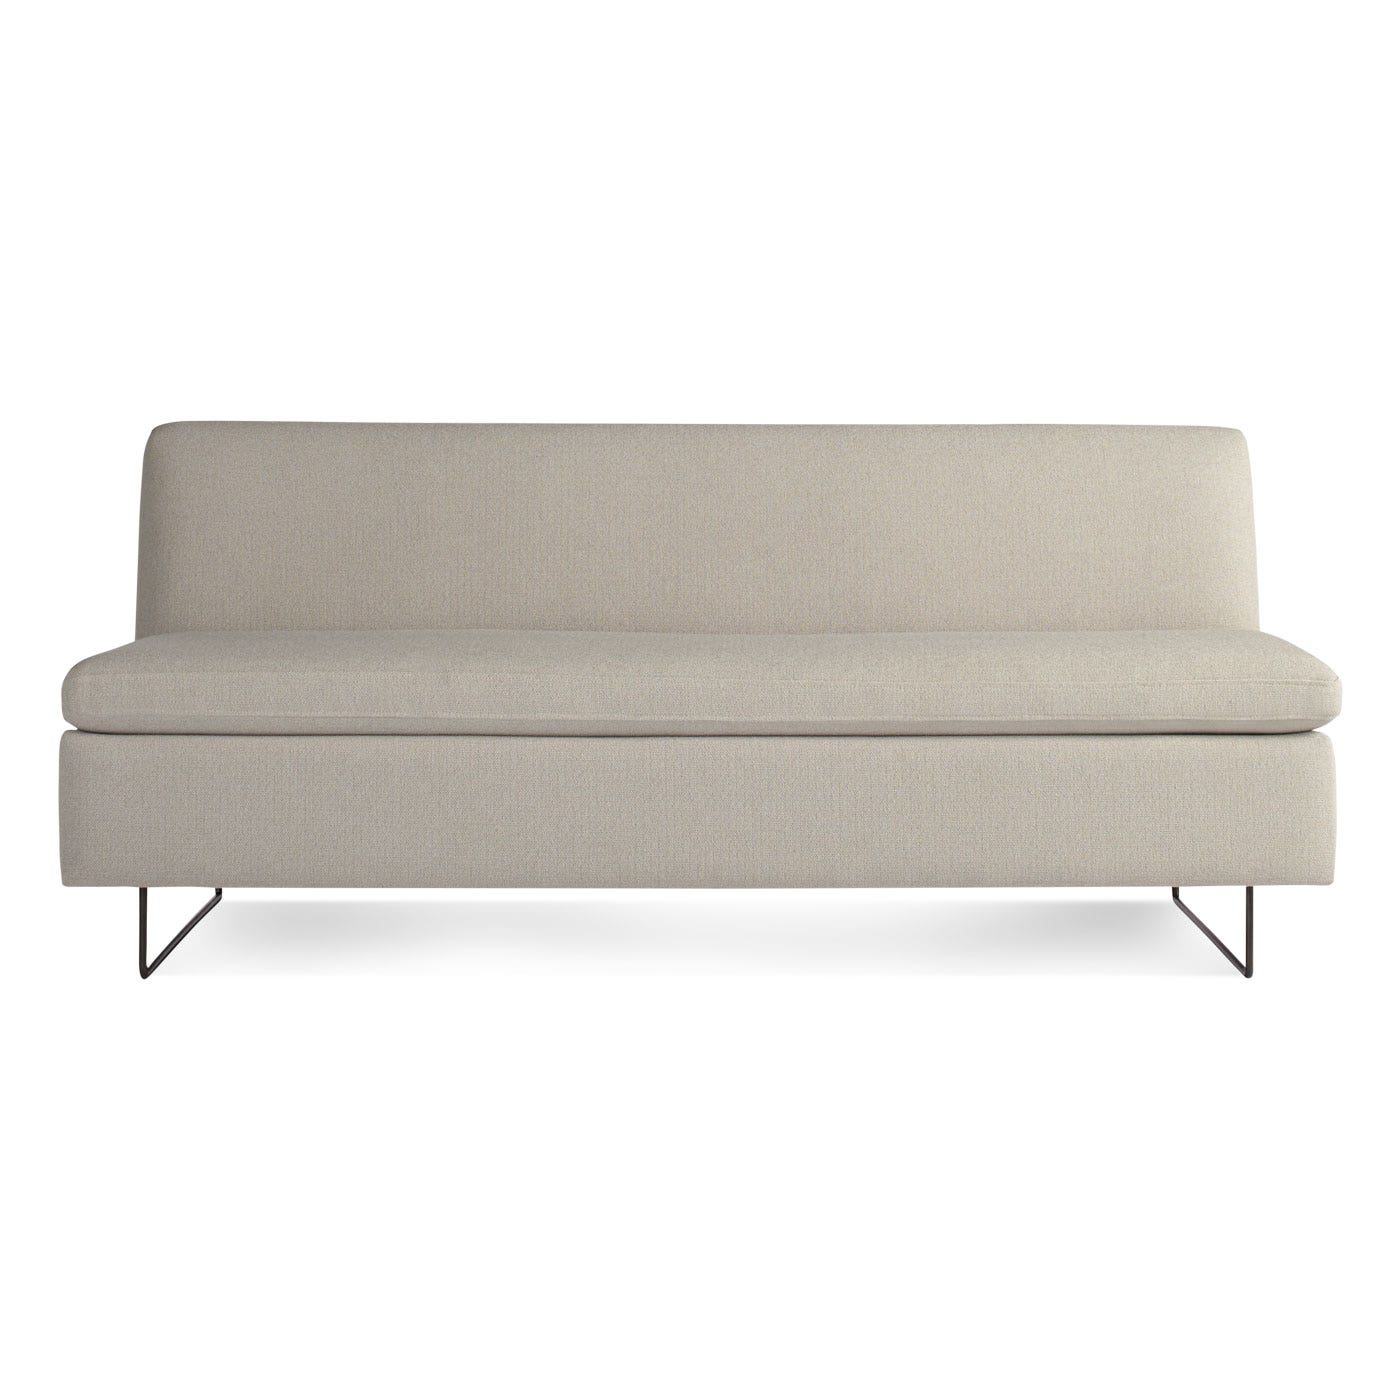 clyde sofa modern sofas sleepers blu dot rh bludotmexico com